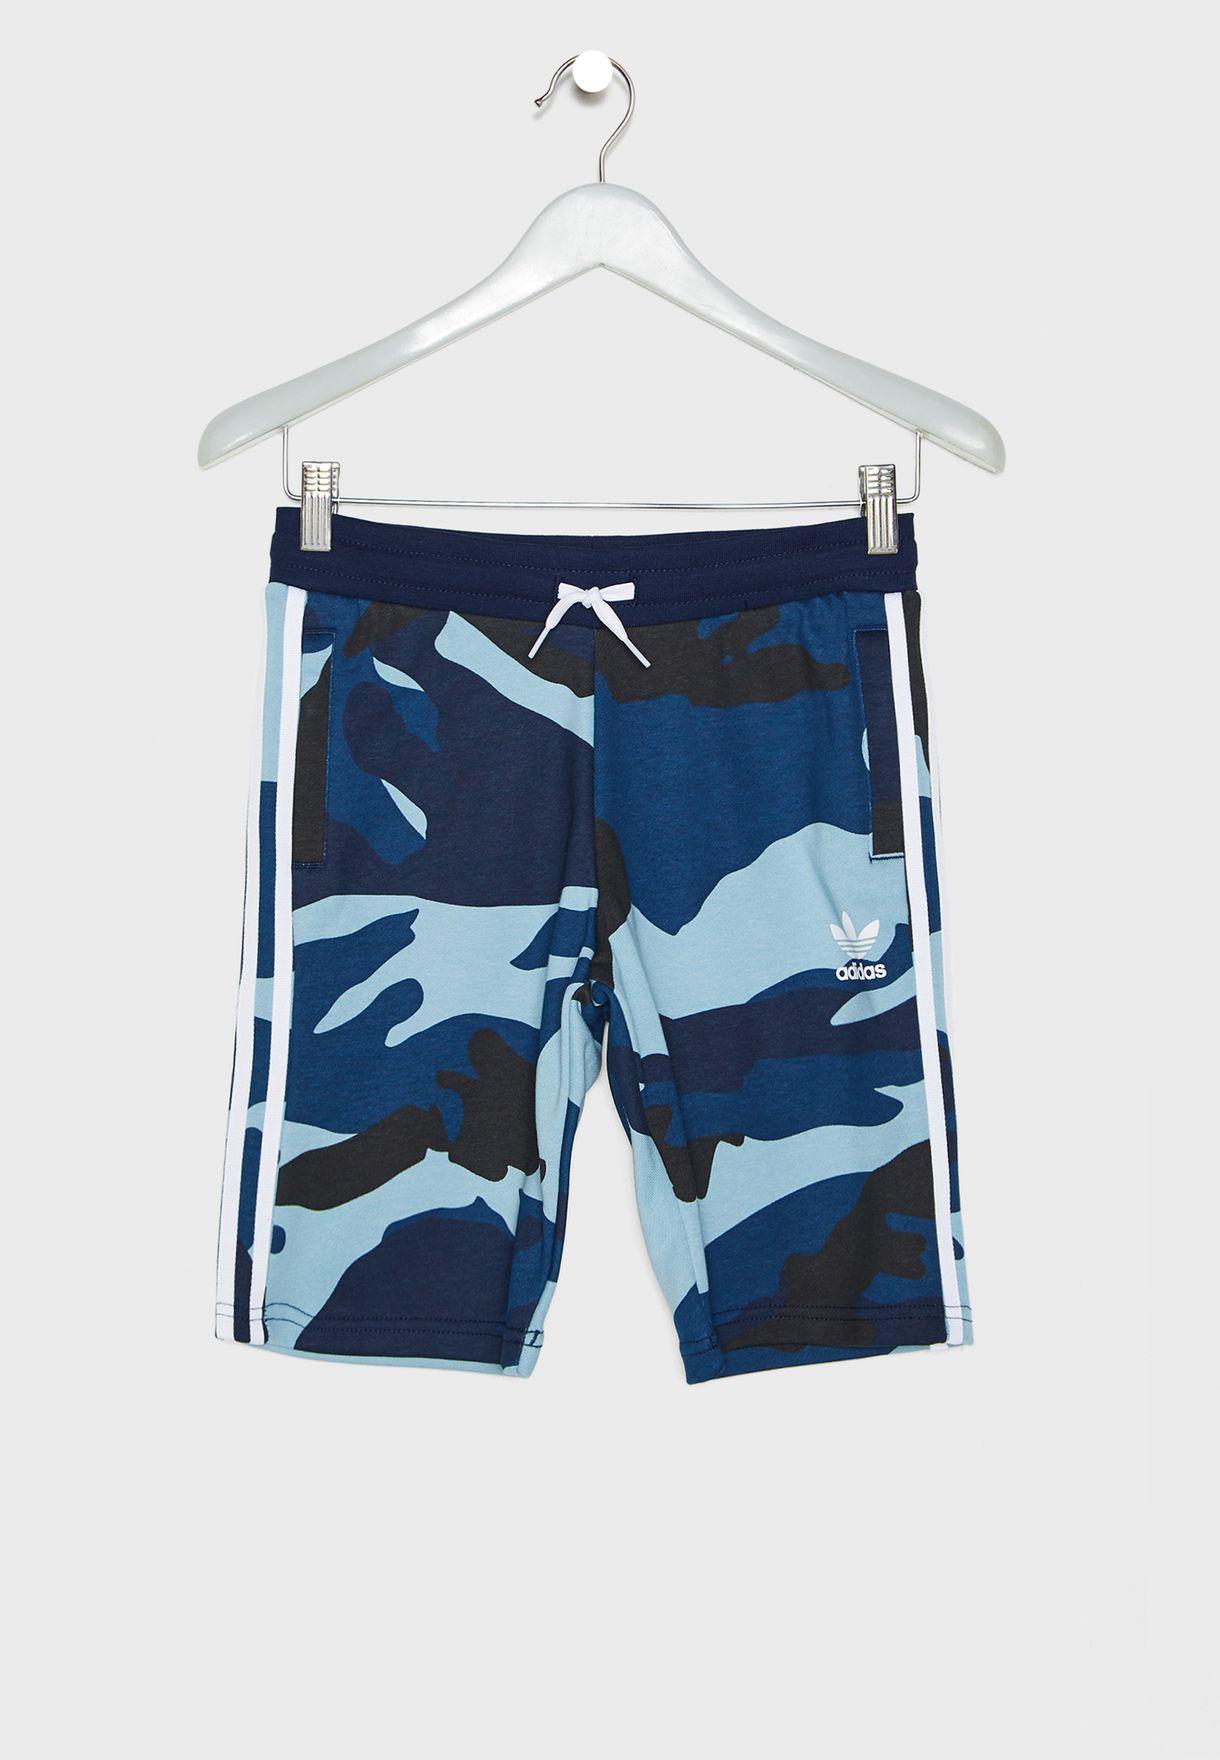 81597ba825af8 Shop adidas Originals prints Youth Camo Shorts DW3836 for Kids in ...